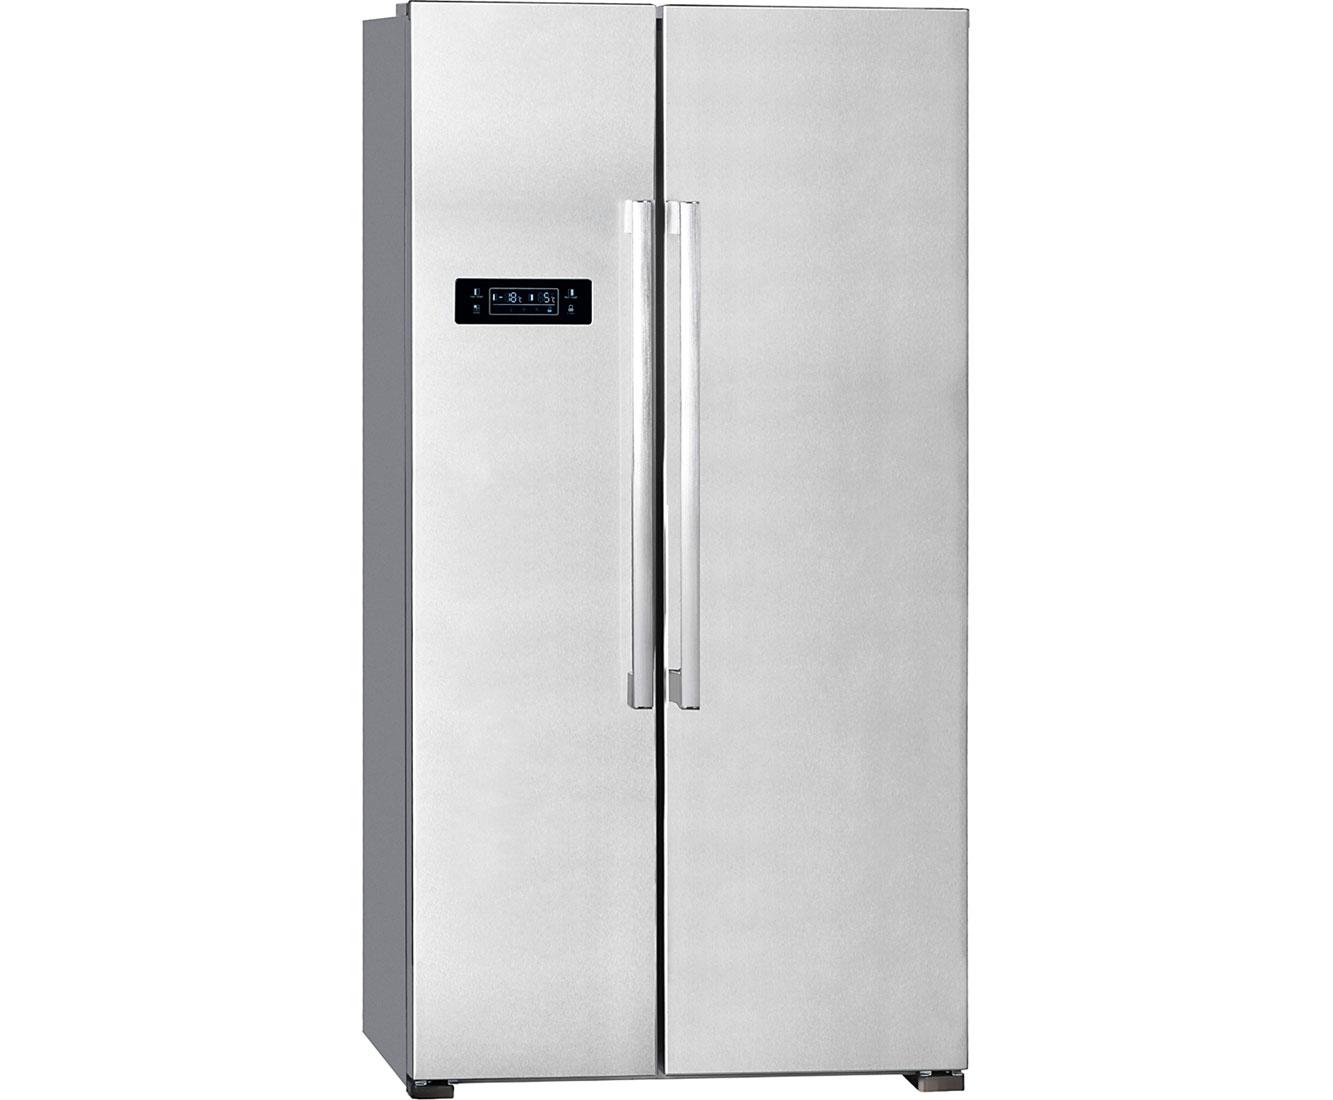 Side By Side Kühlschrank Quelle : Rabatt preisvergleich haushalt u e kühlschränke u e side by side